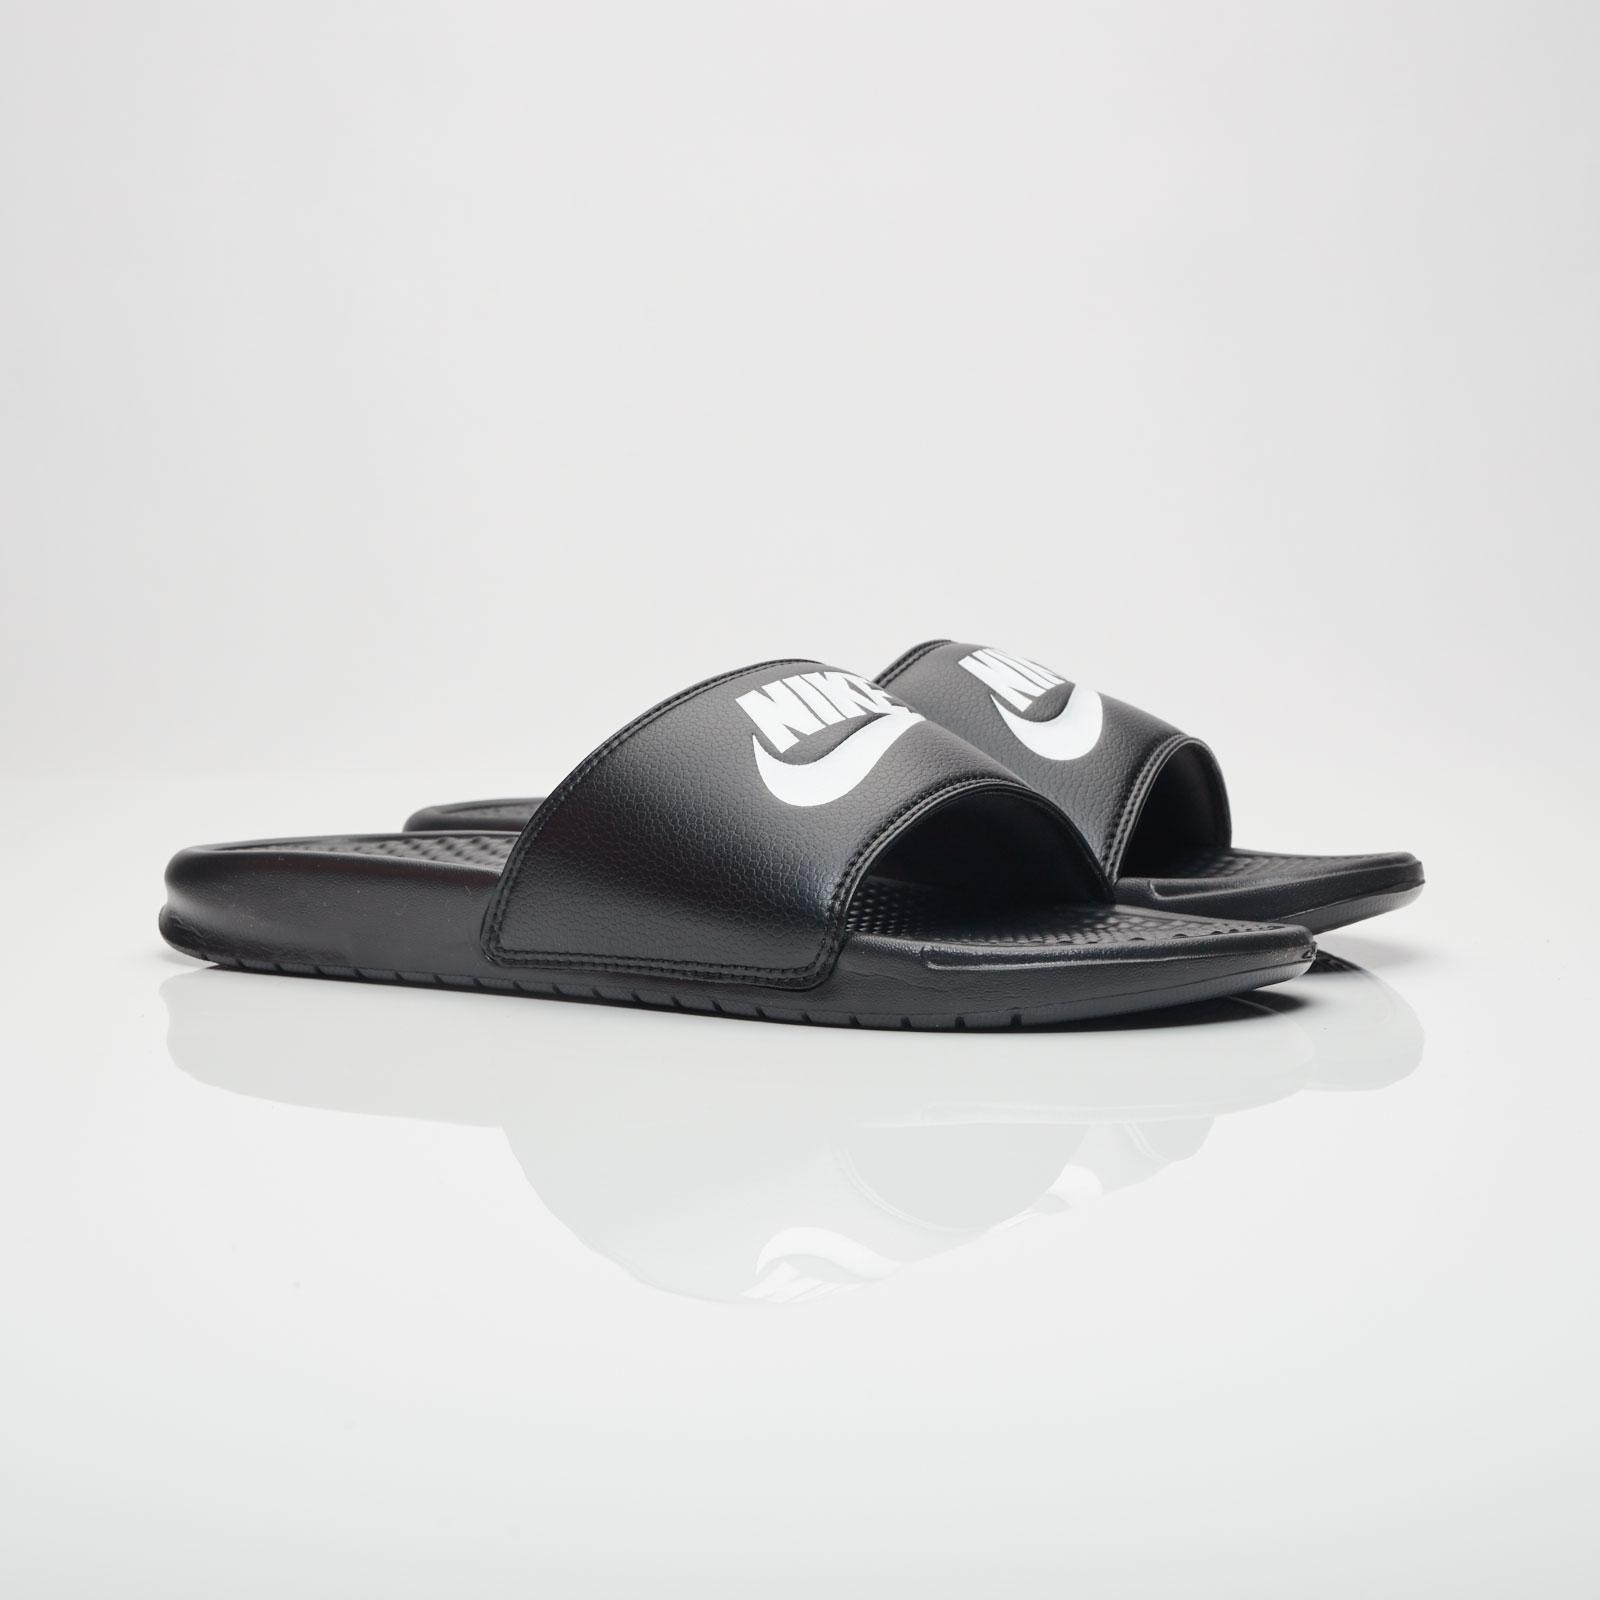 f1c8f08e4770a Nike Benassi JDI - 343880-090 - Sneakersnstuff